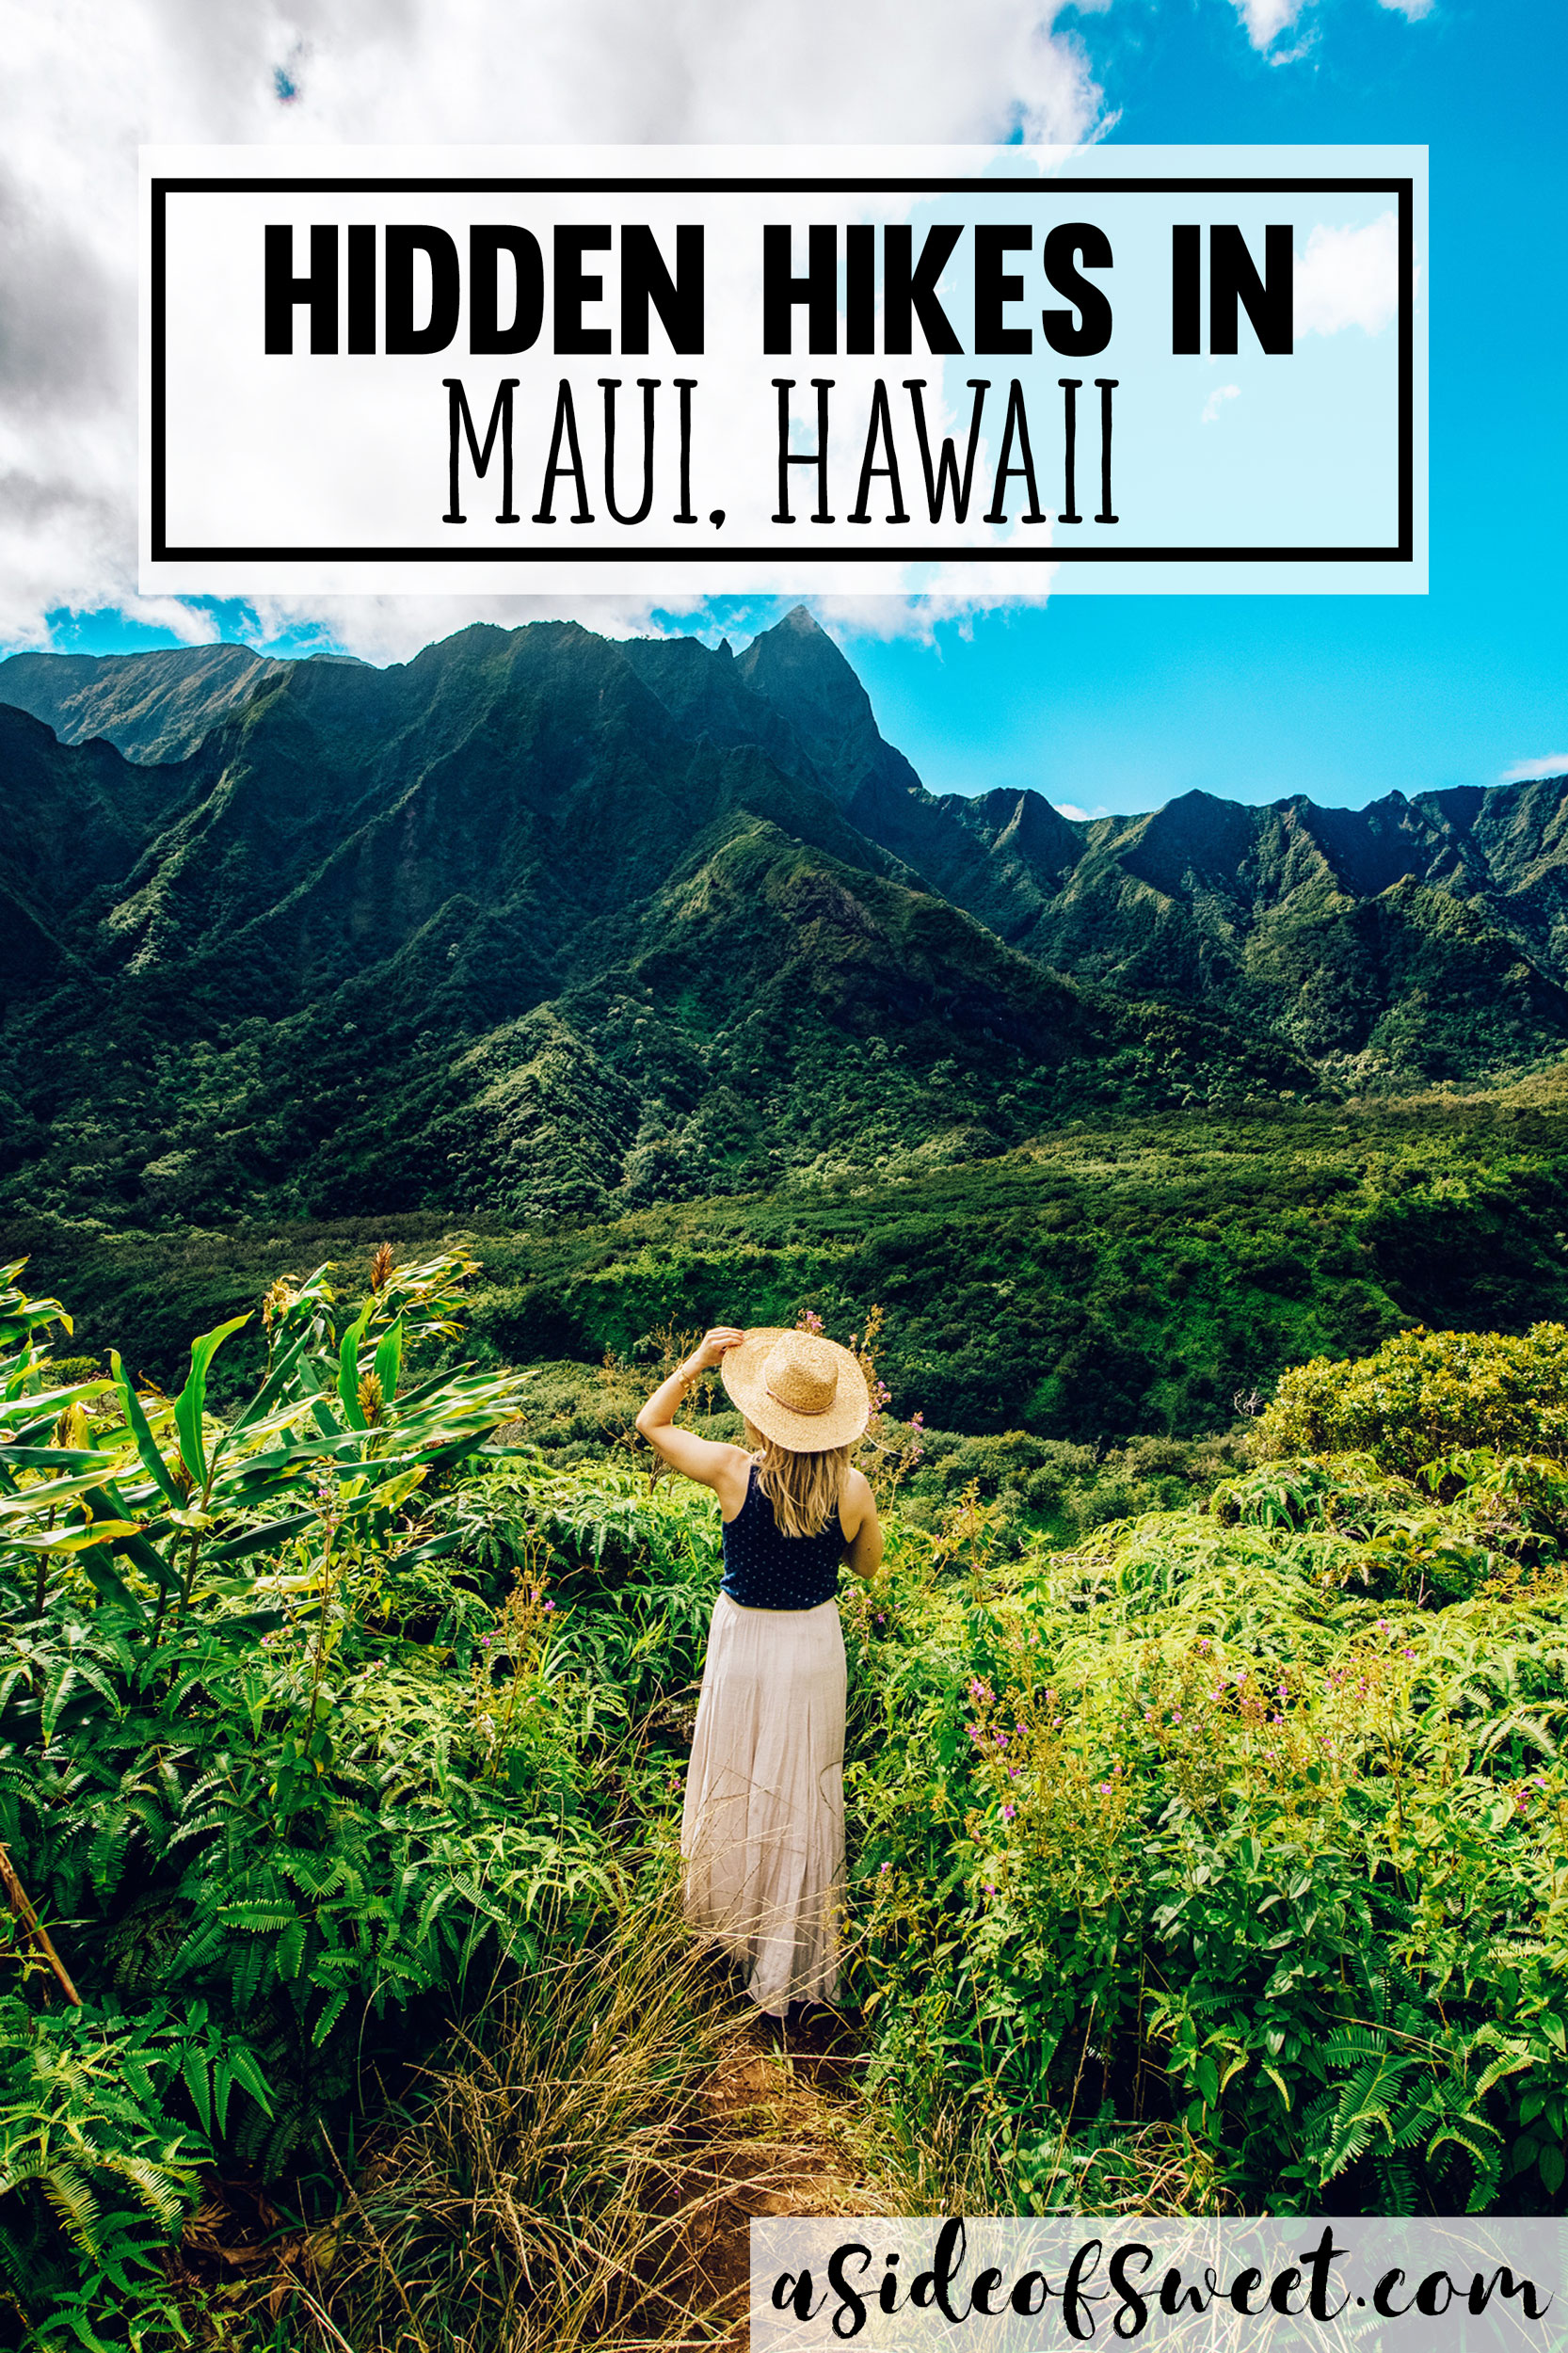 Hidden Maui Hikes You Shouldn't Miss - Bamboo & Waterfalls Secret Hike Hawaii Waterfalls